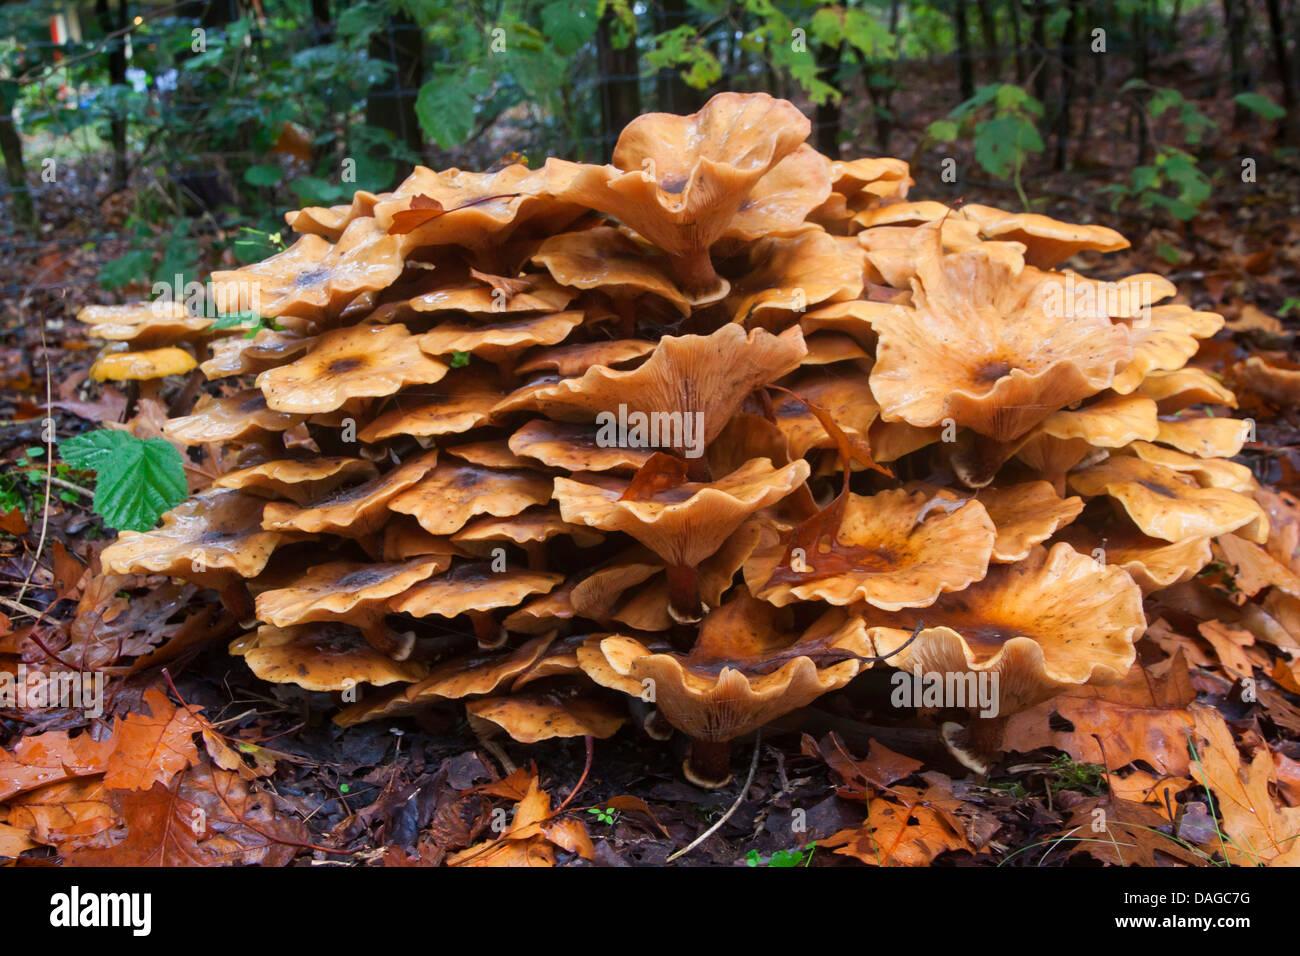 honey fungus (Armillaria mellea), old fruiting bodies, Germany - Stock Image